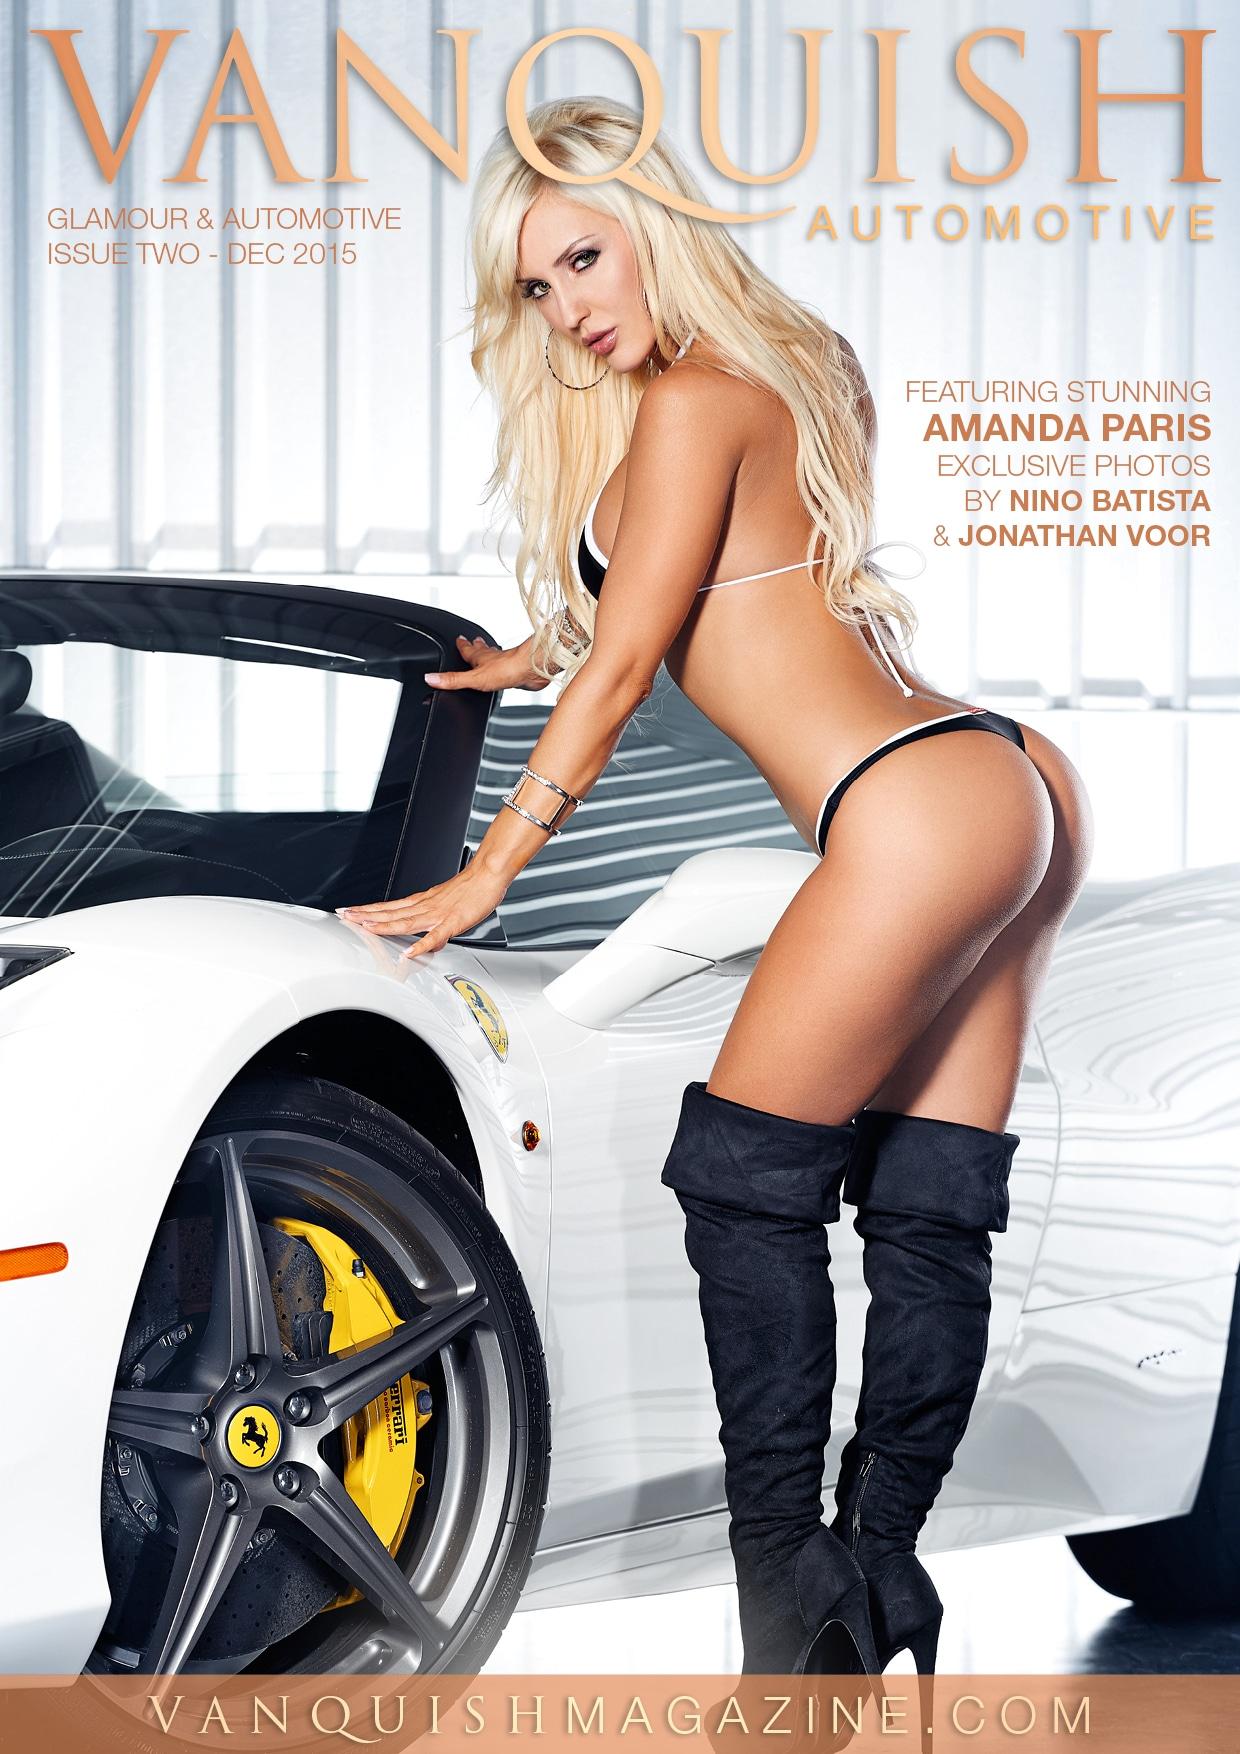 Vanquish Automotive ANZ - Issue 2 - Amanda Paris 1